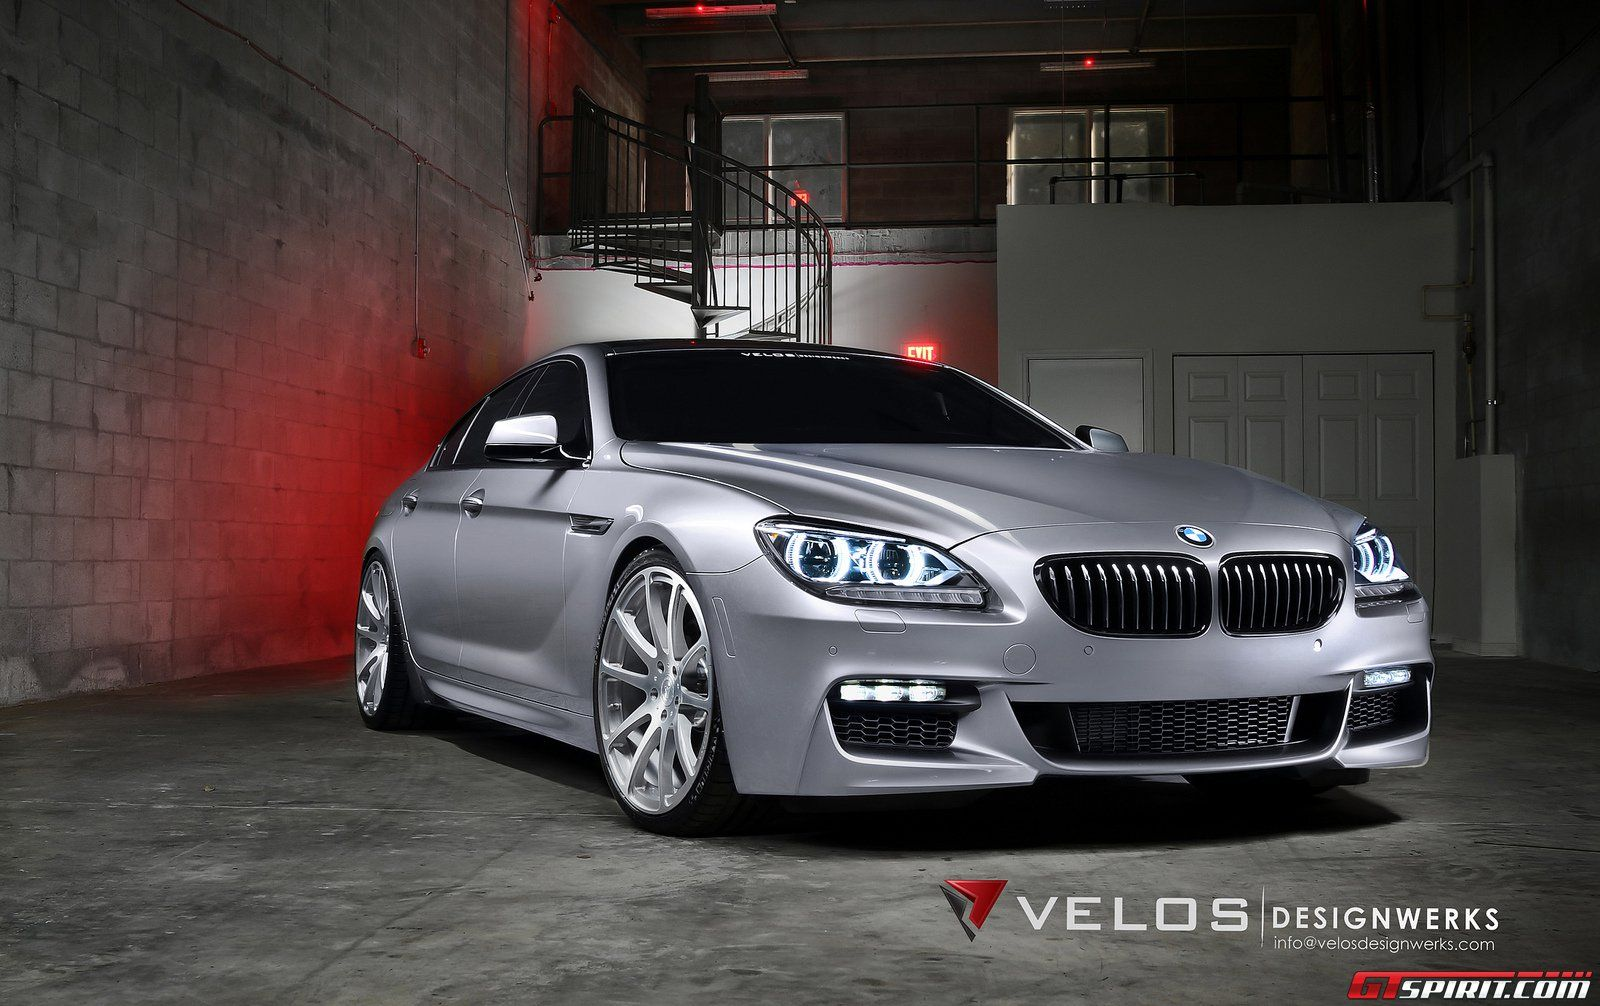 Velos designwerks bmw 650i gran coupe